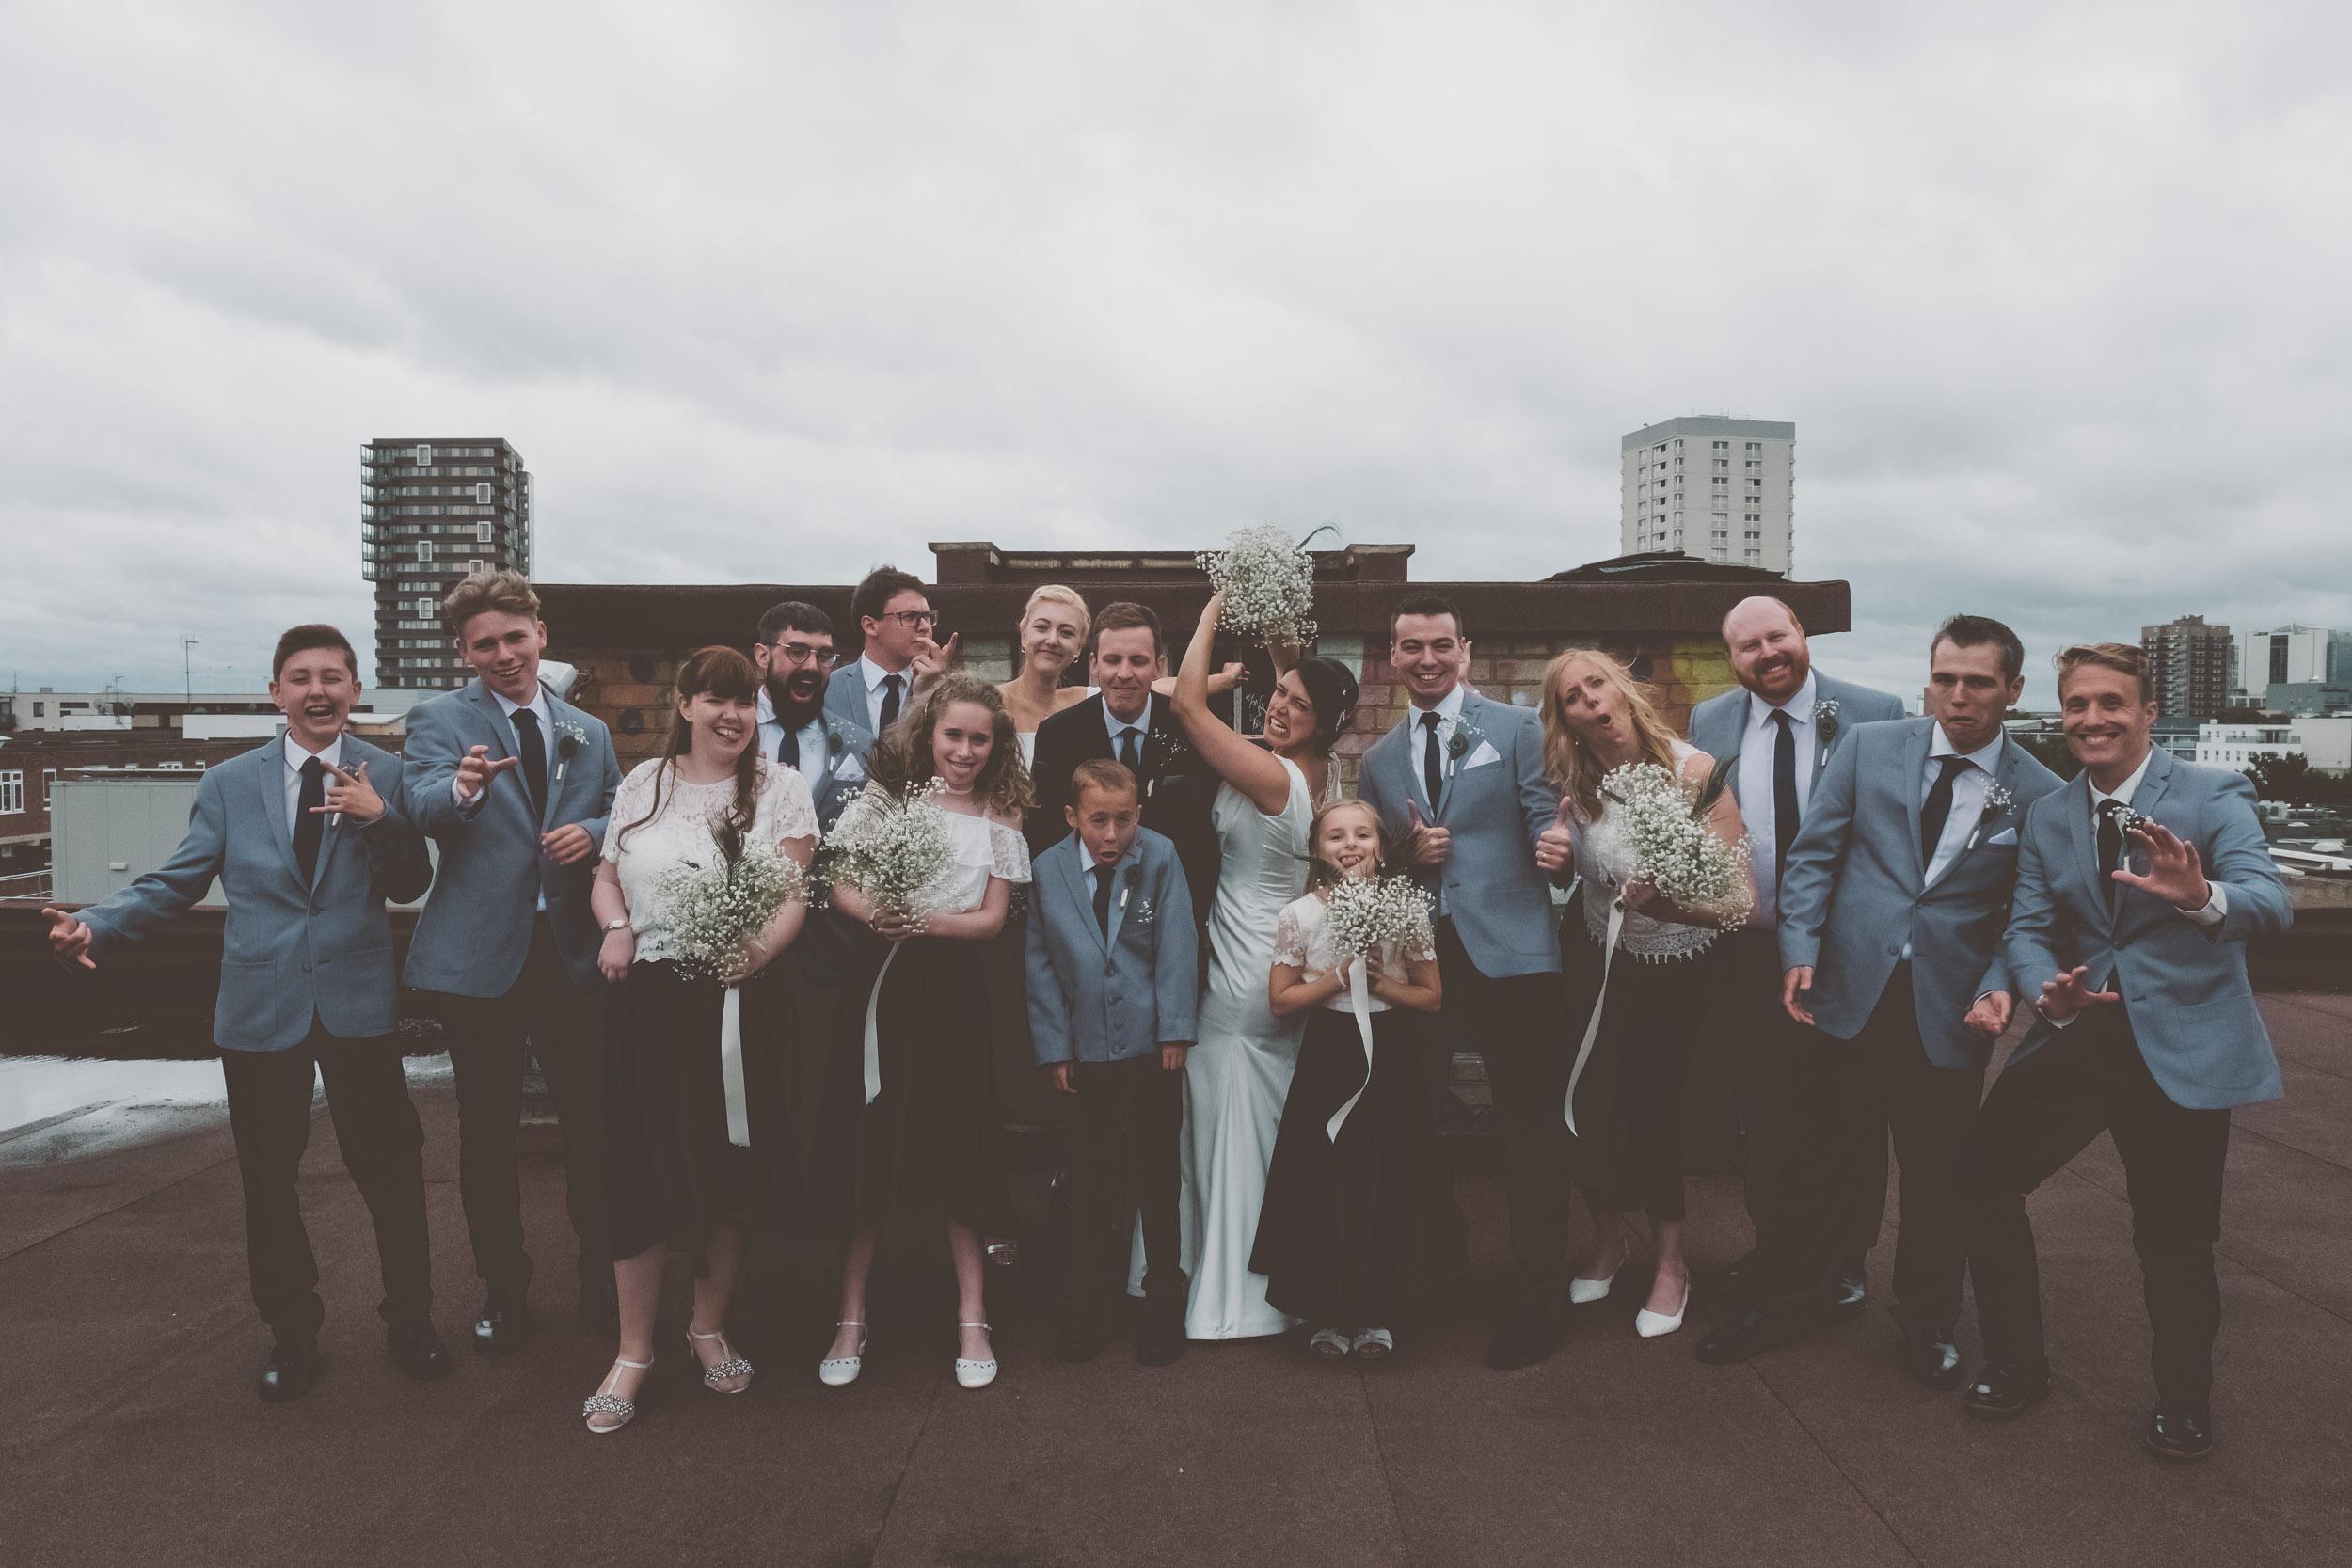 islington-town-hall-4th-floor-studios-wedding267.jpg